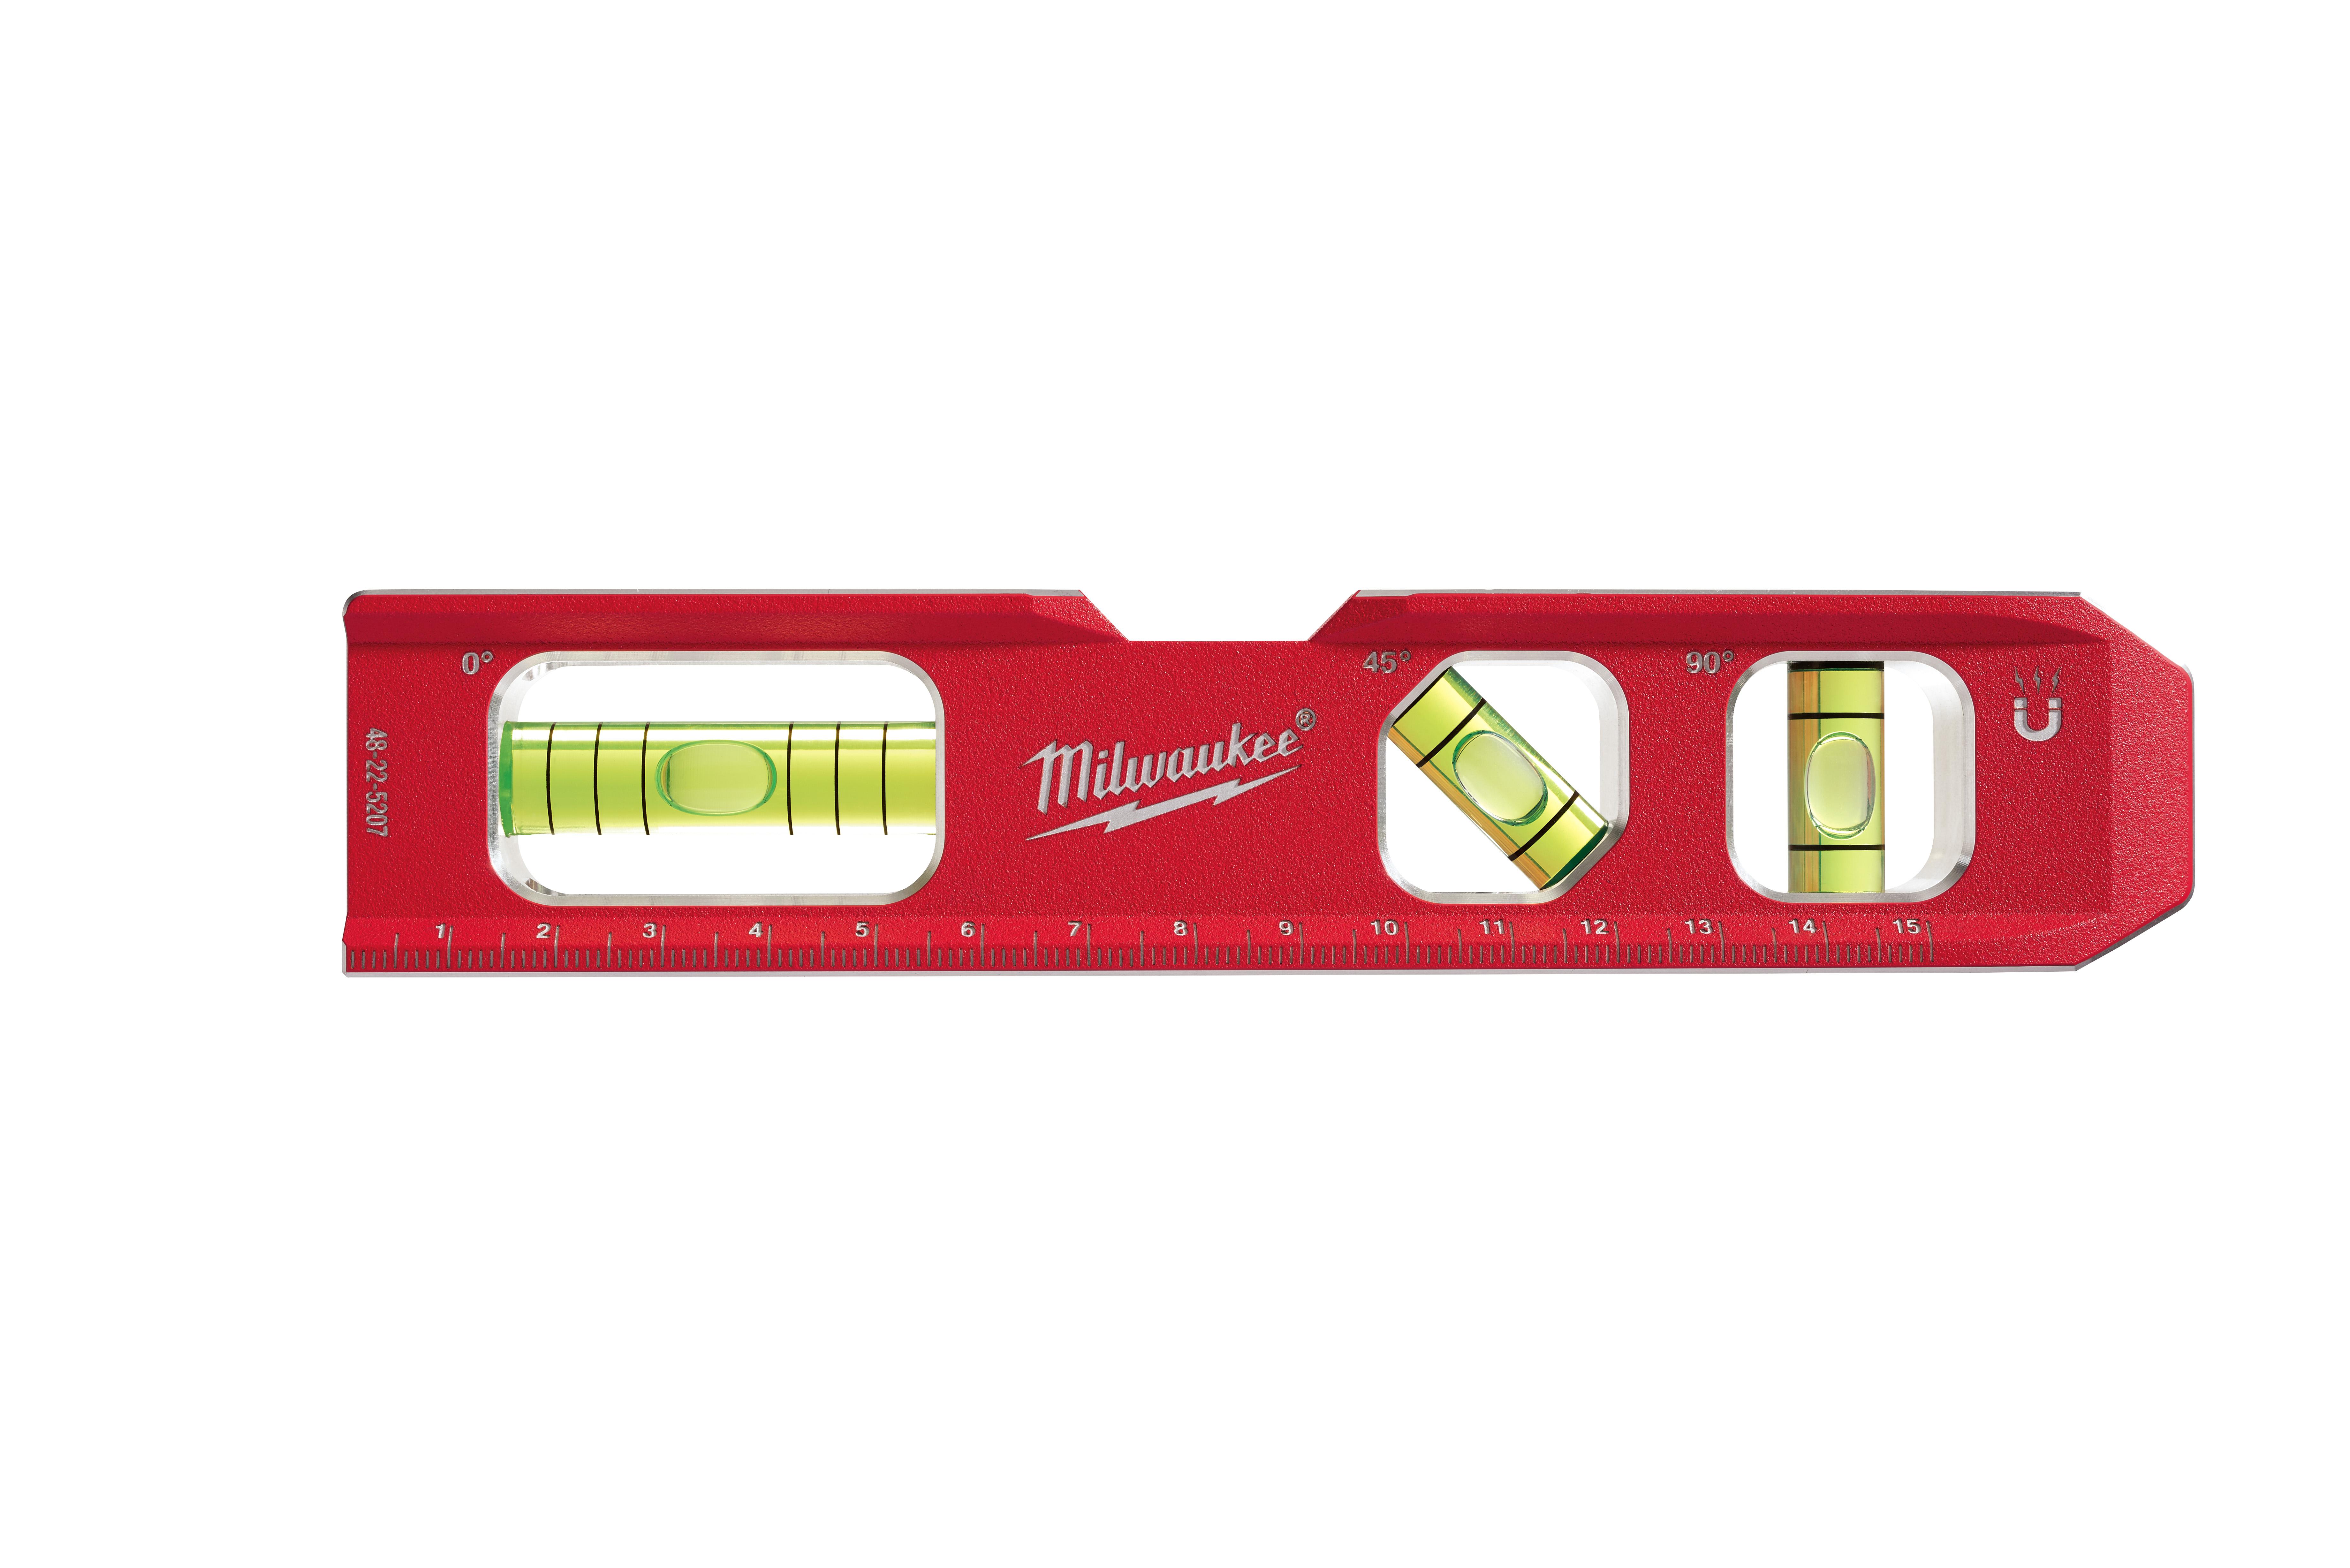 Milwaukee® 48-22-5207 Billet Compact Torpedo Level, 7 in L, 3 Vials, Plastic